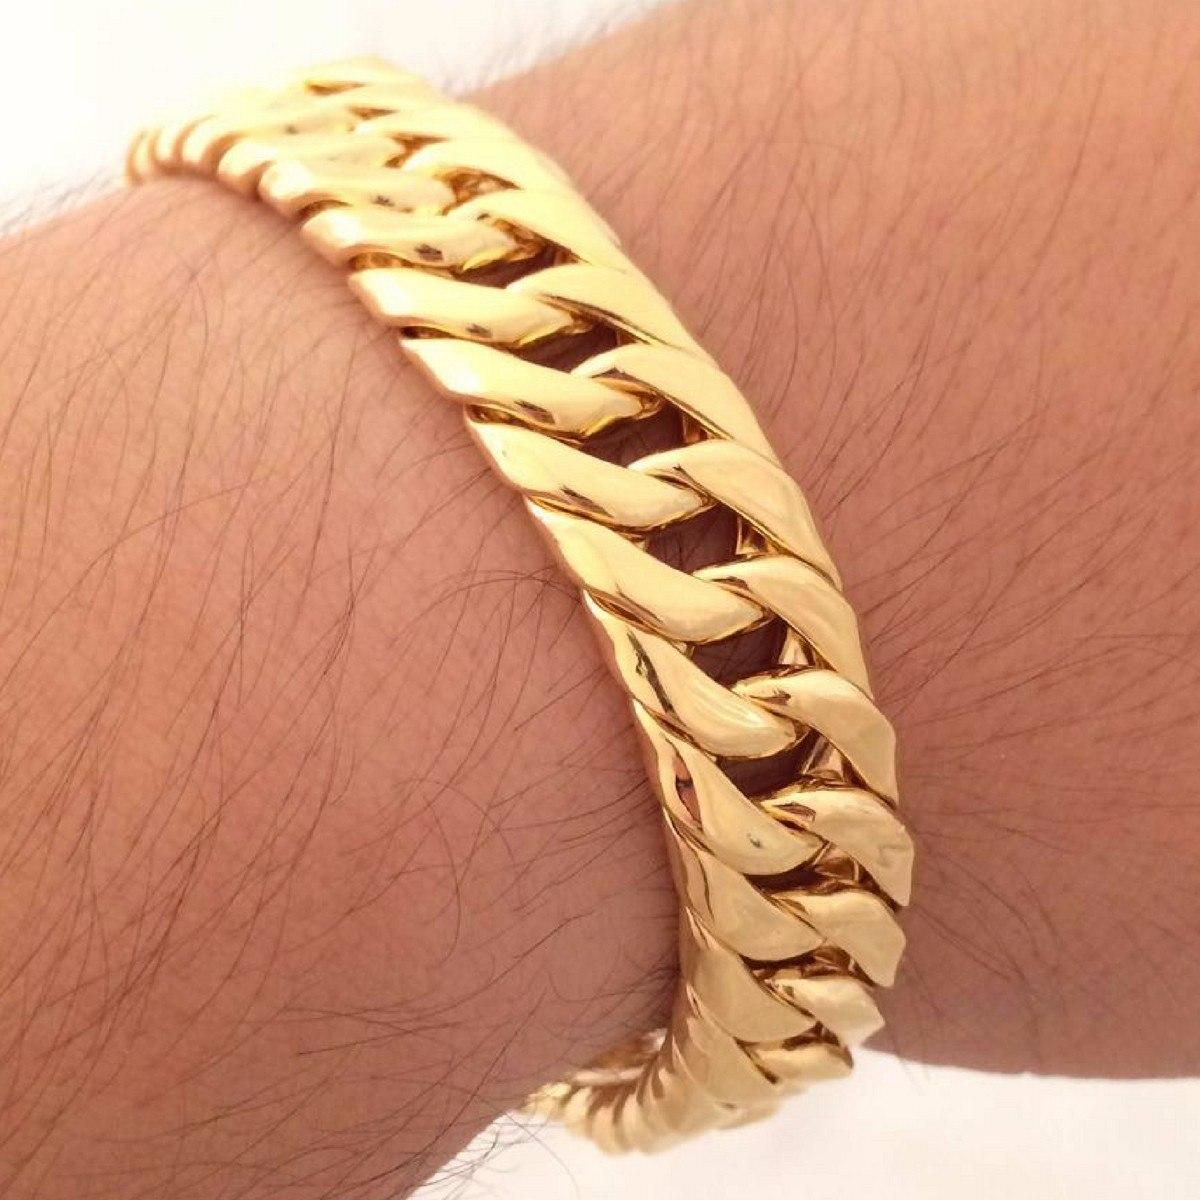 c0060e036aef7 pulseira masculina dourada ouro 18k banhada 11mm polida. Carregando zoom.